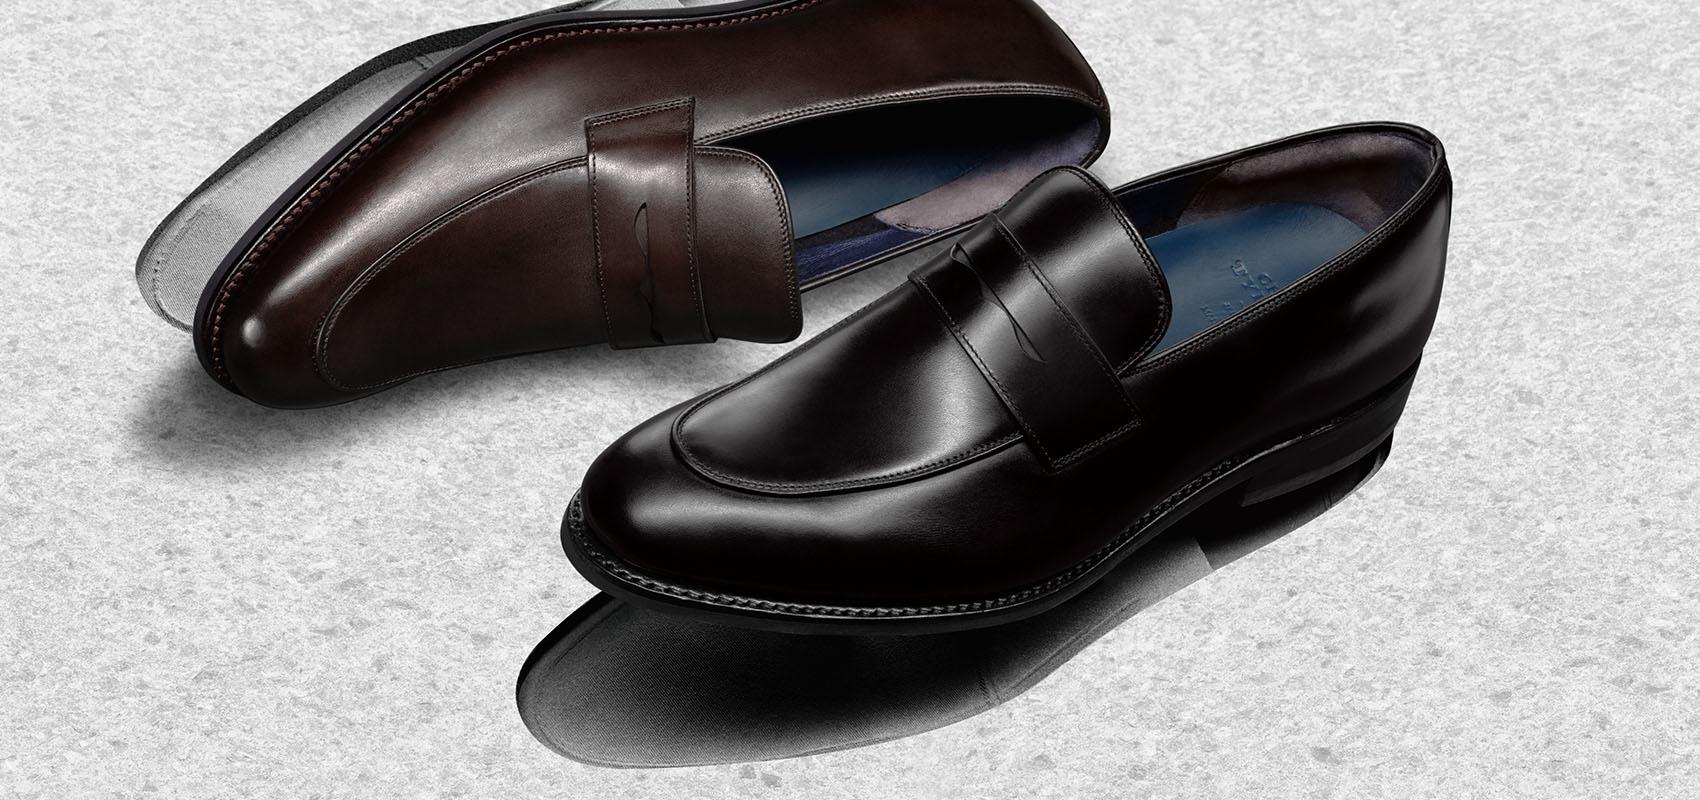 Charles Tyrwhitt Performance Shoes